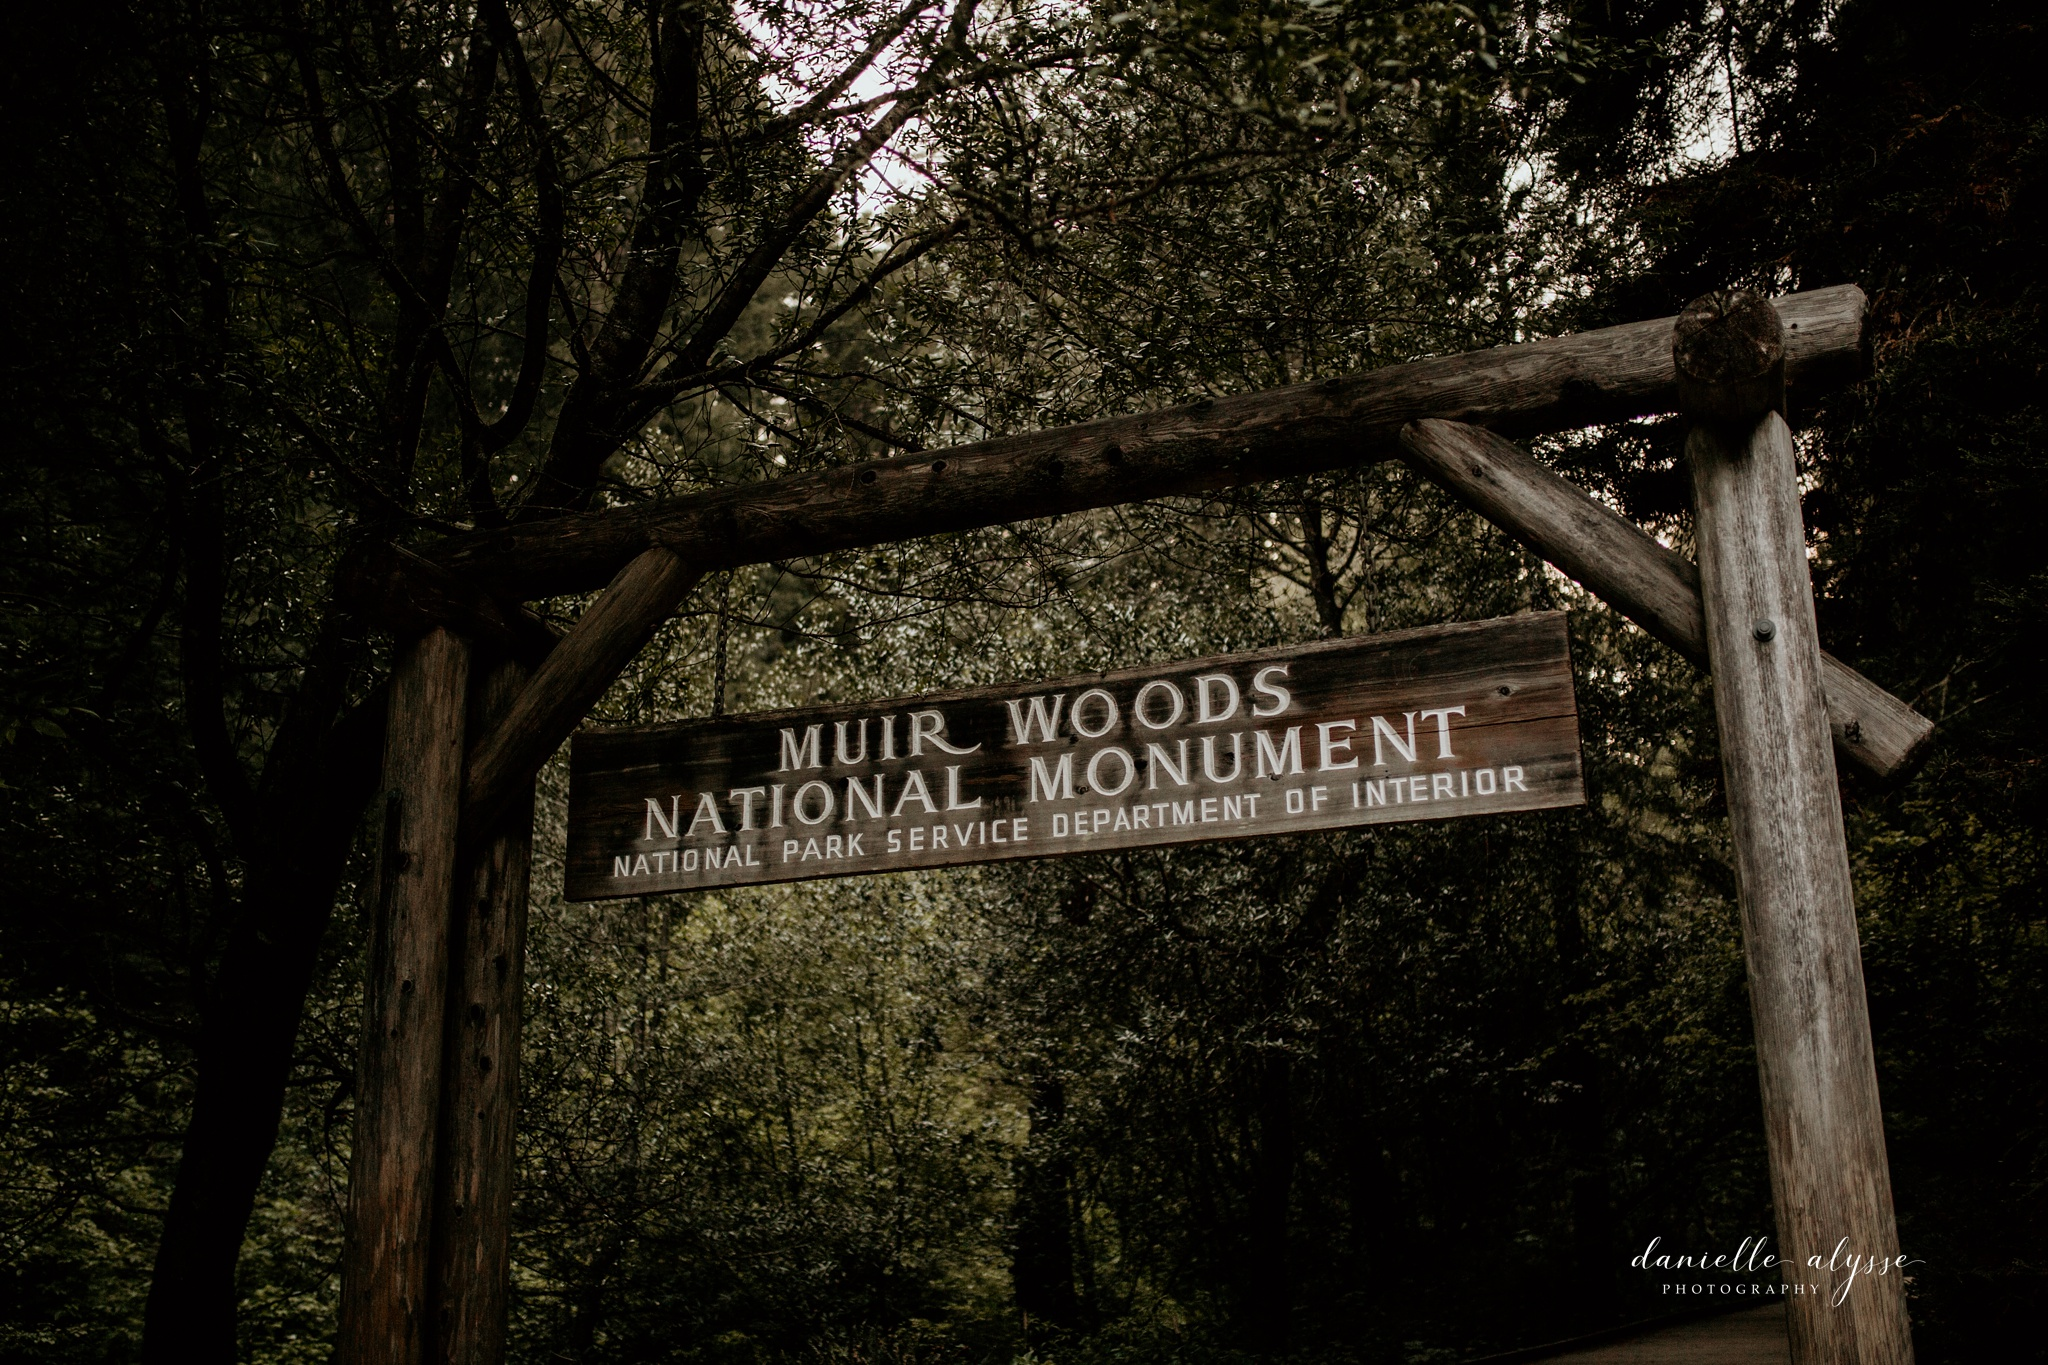 180503_engagement_bianca_muir_woods_mill_valley_danielle_alysse_photography_bay_area_photographer_blog_82_WEB.jpg